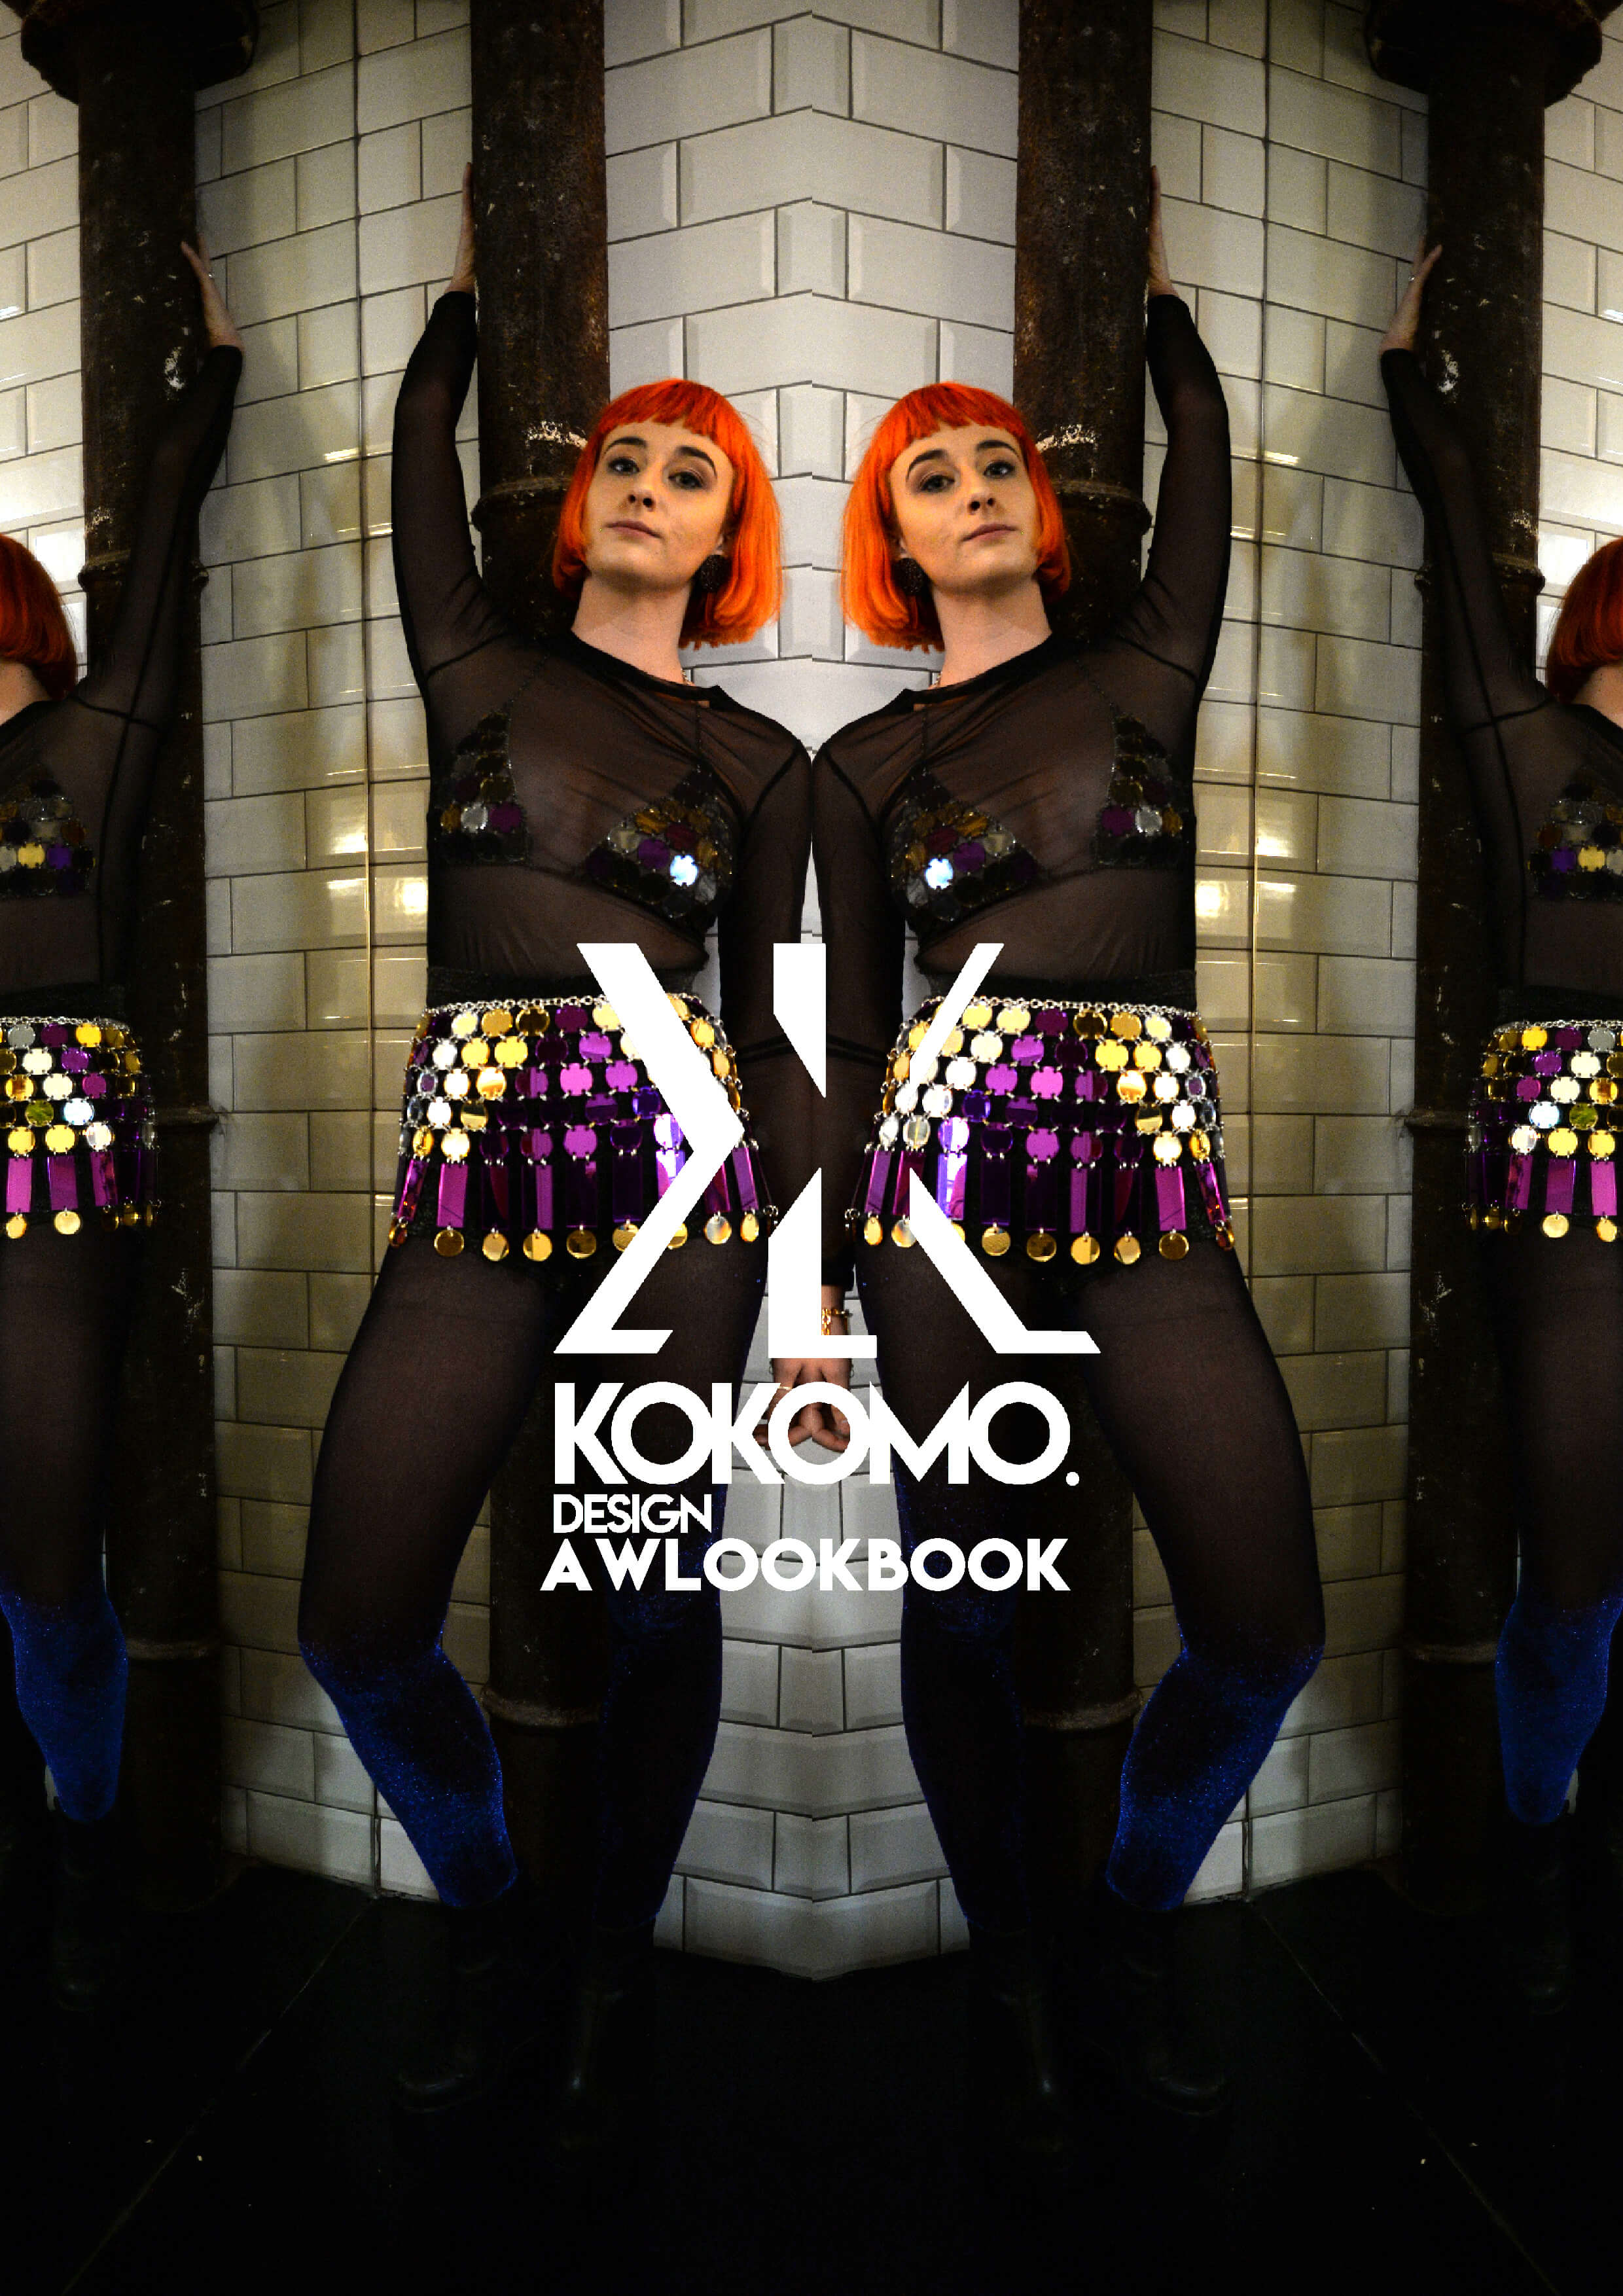 Kokomo-Design-Disco-Disco-AW-01